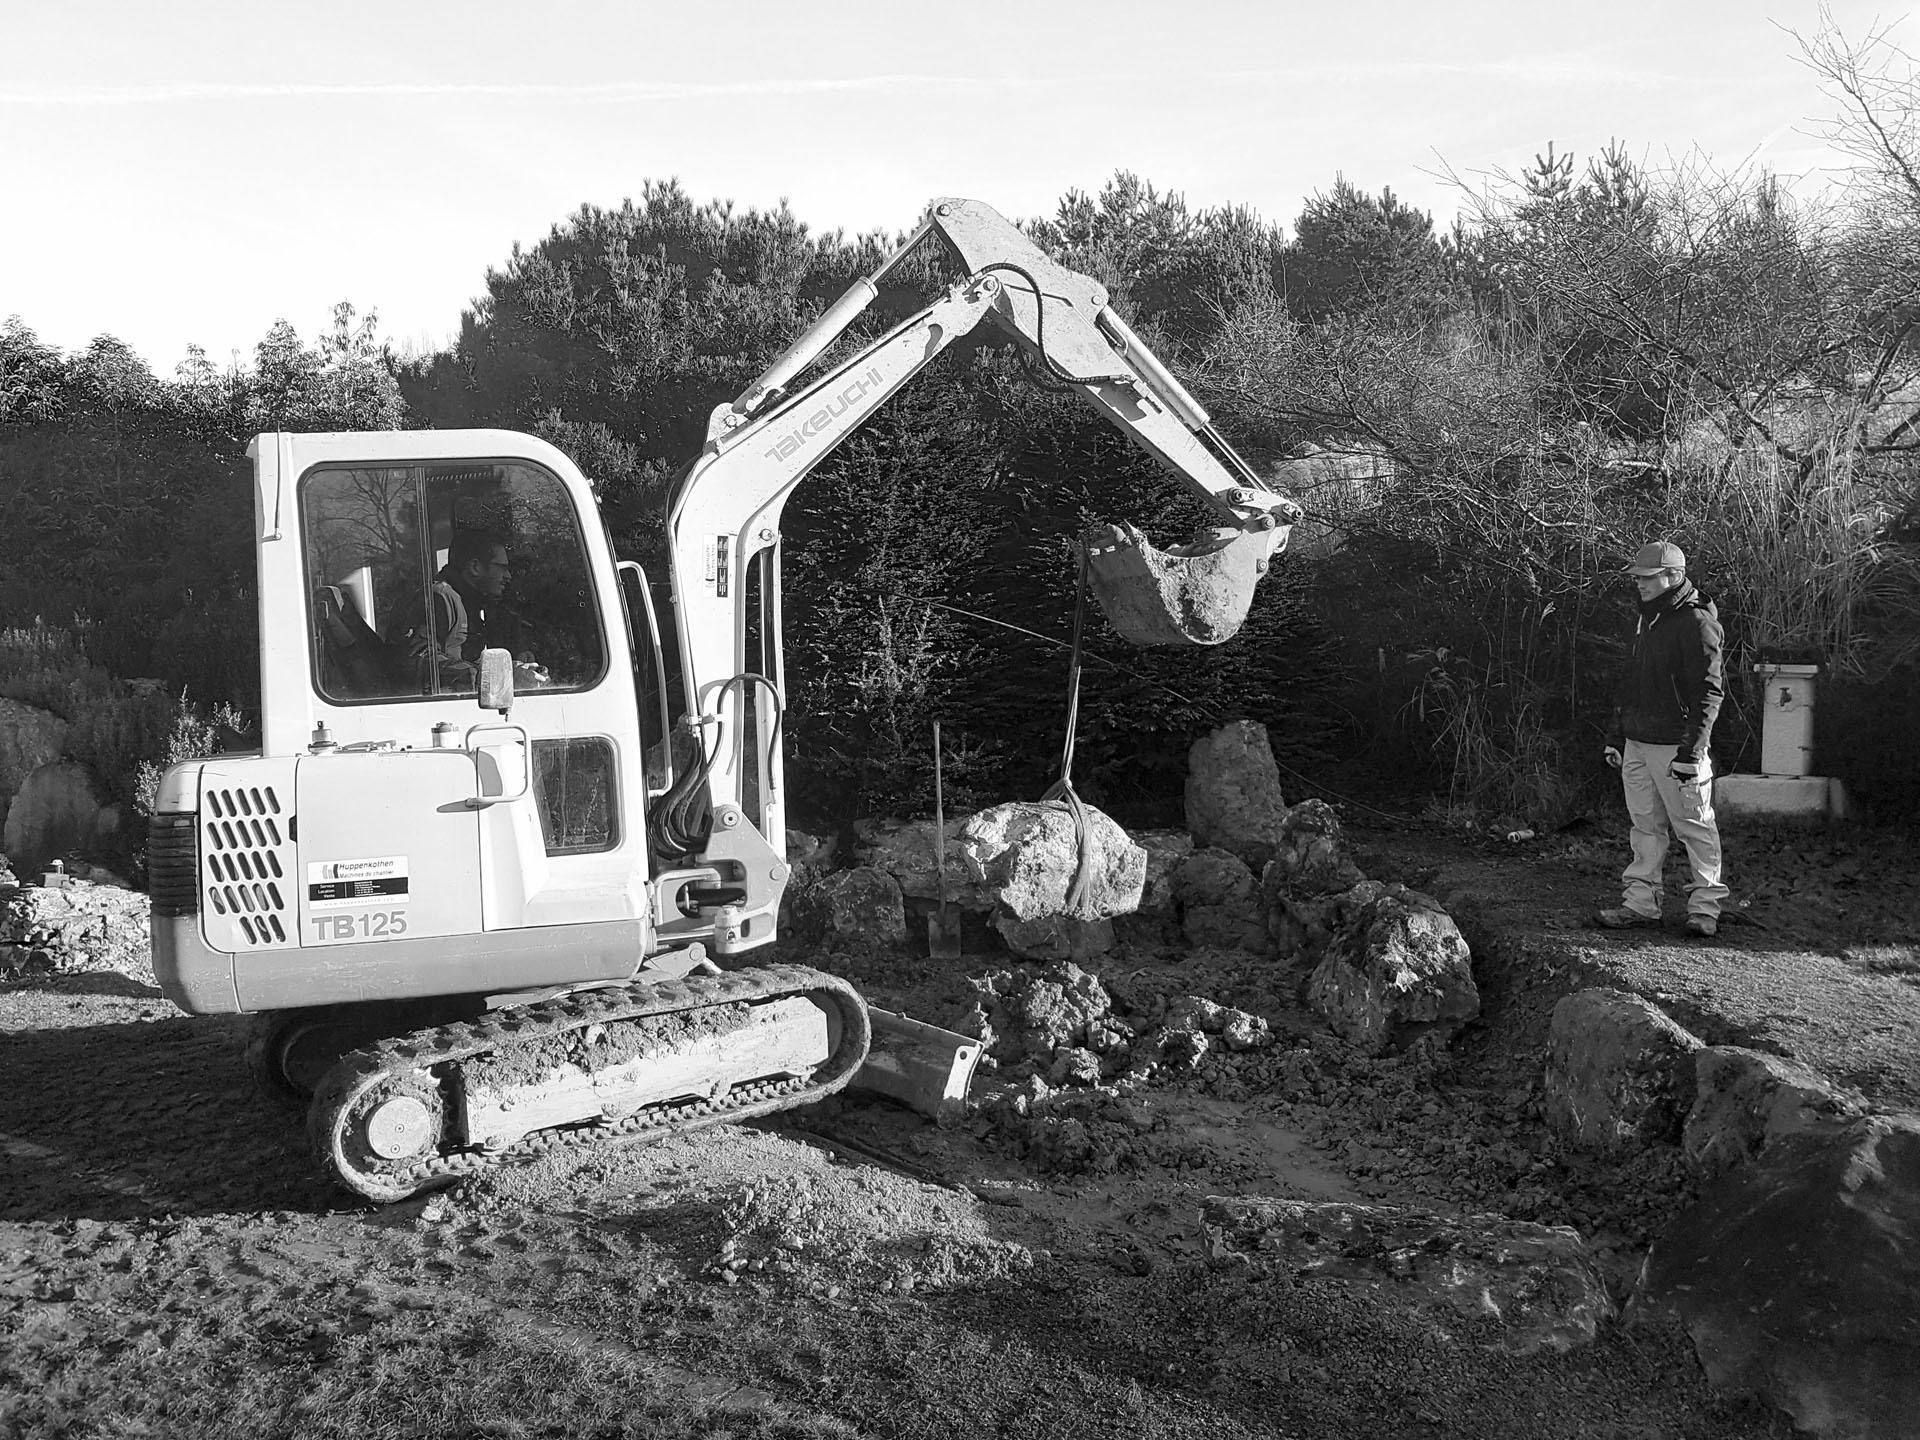 Presinge pond : Work